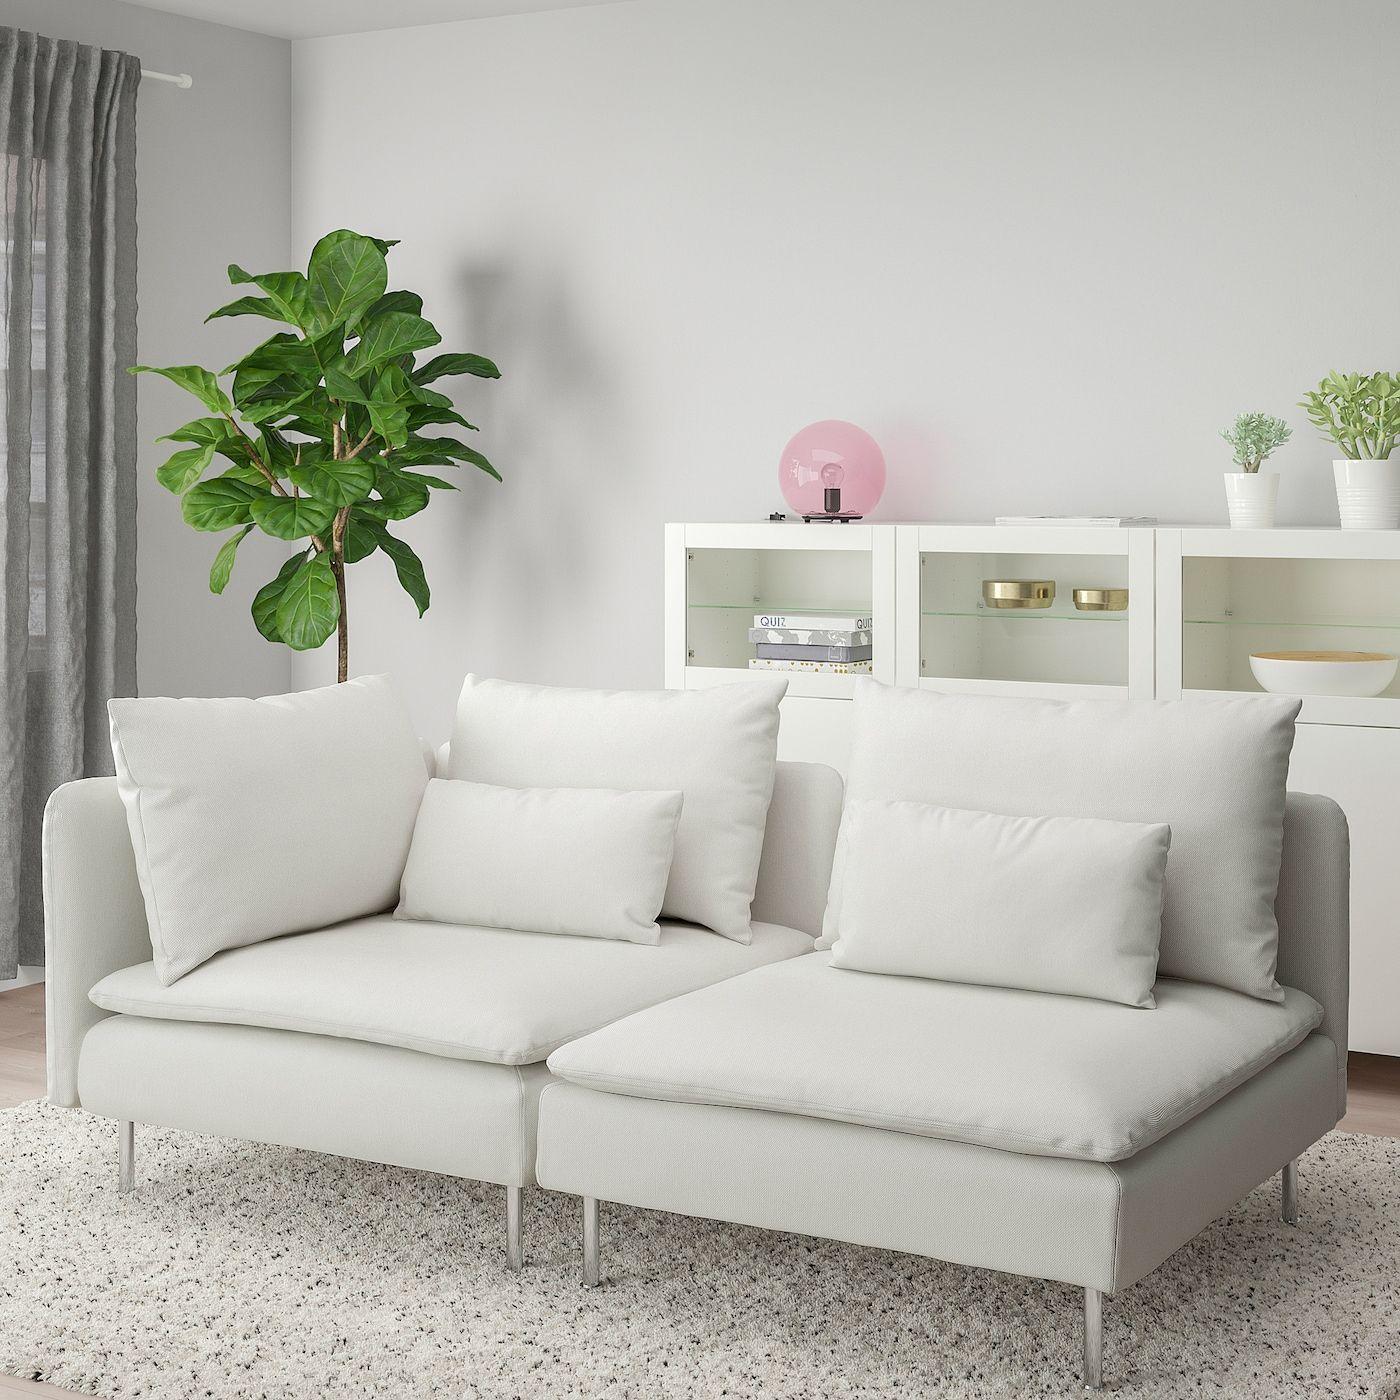 Soderhamn 3er Sofa Ohne Abschluss Finnsta Weiss Ikea Osterreich In 2020 Ikea Comfortable Sofa Bed Slats